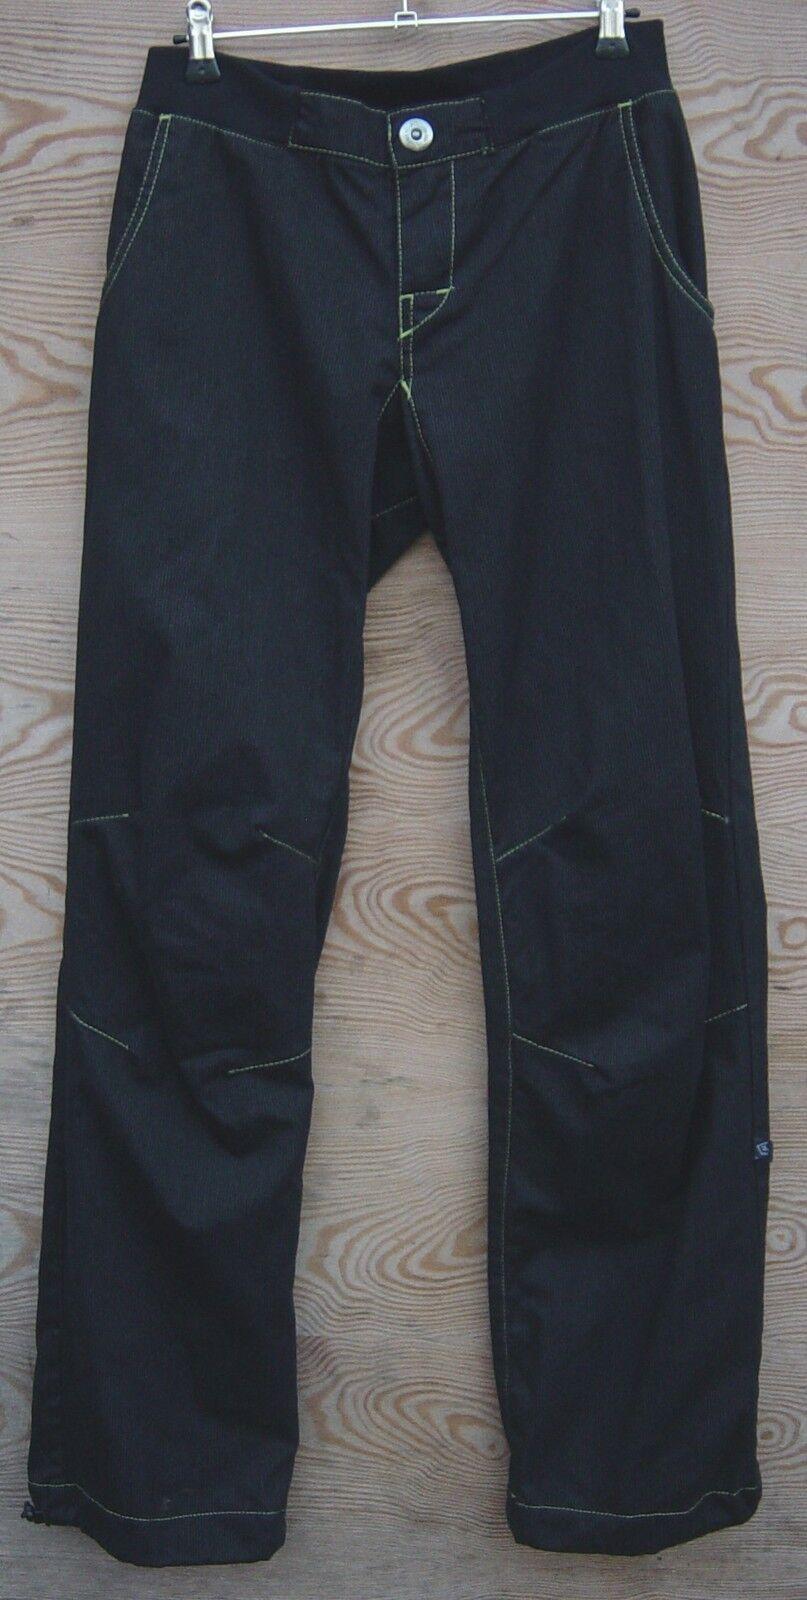 E9 Pantalones para Escalar para Mujer Mujer Montone, Talla XL, gris Stripes